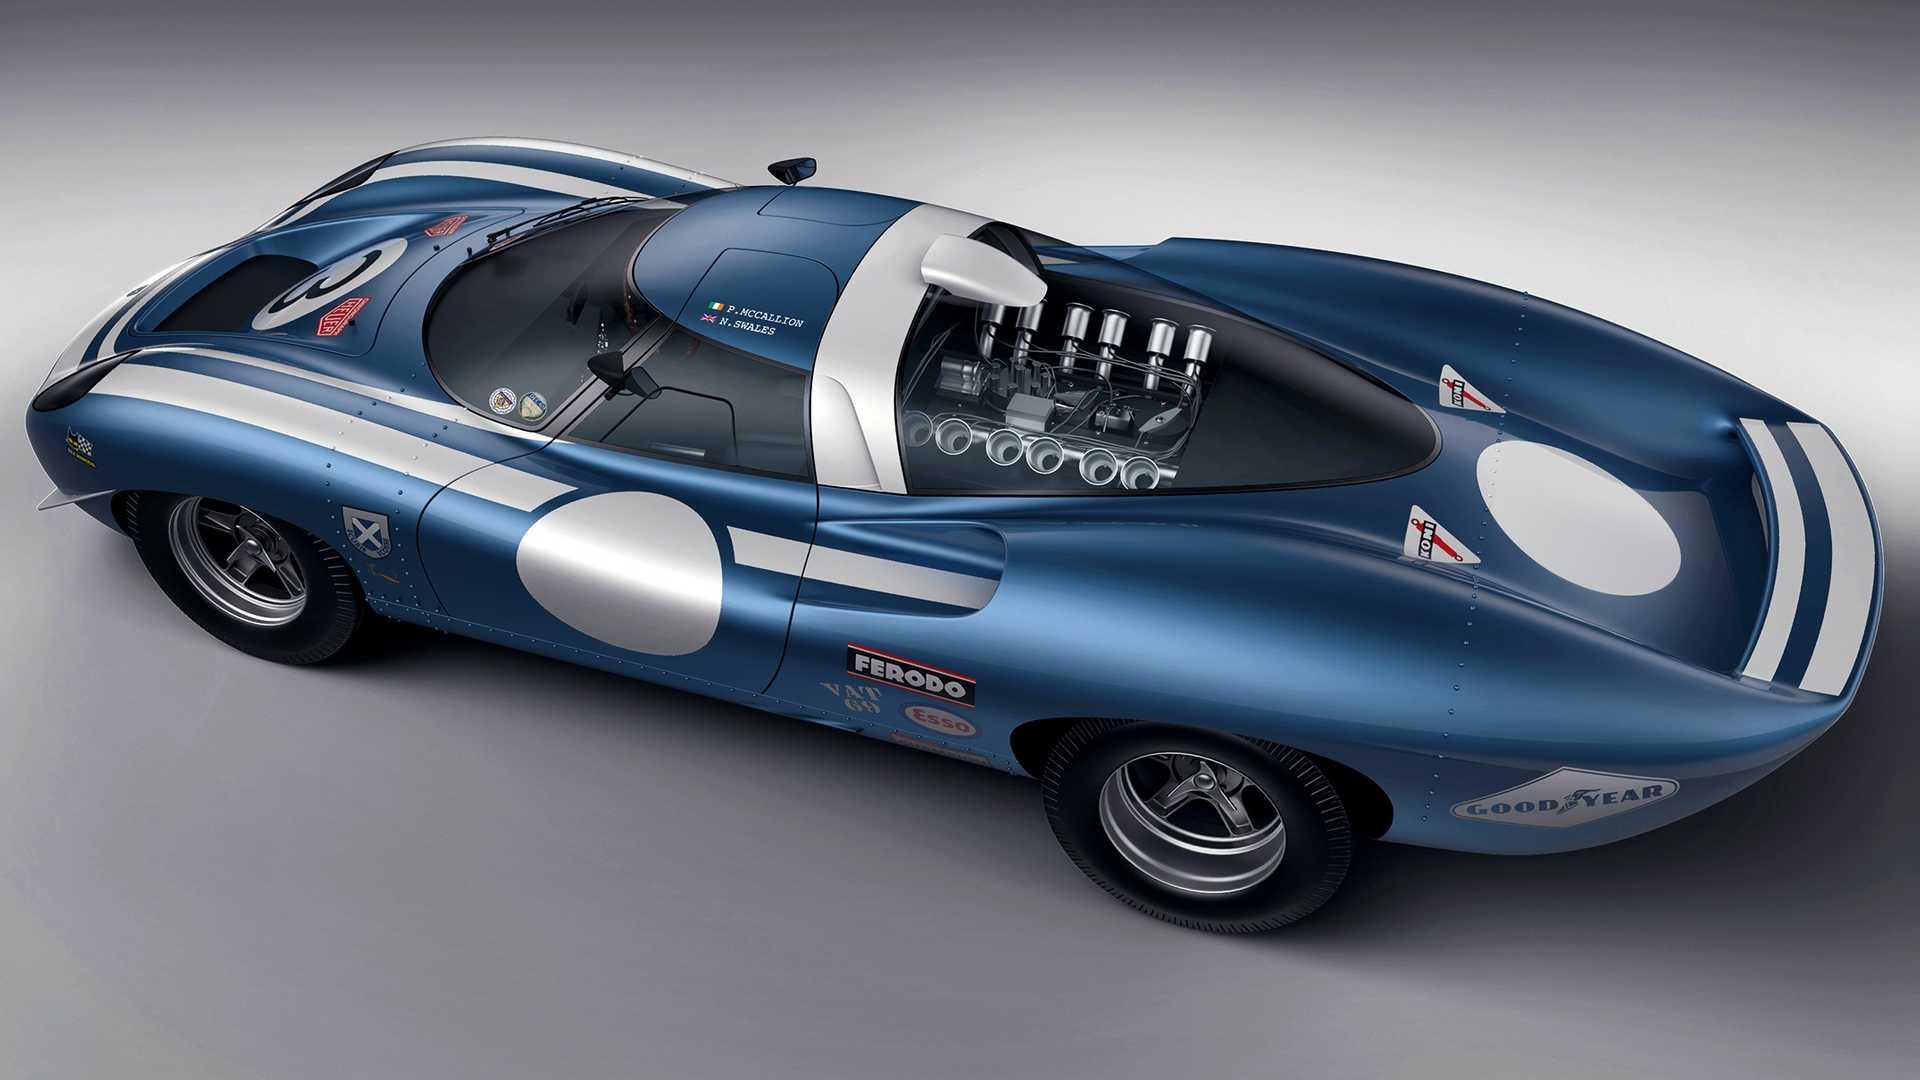 Ecurie Ecosse LM69. Um Protótipo De Le Mans Da Década De